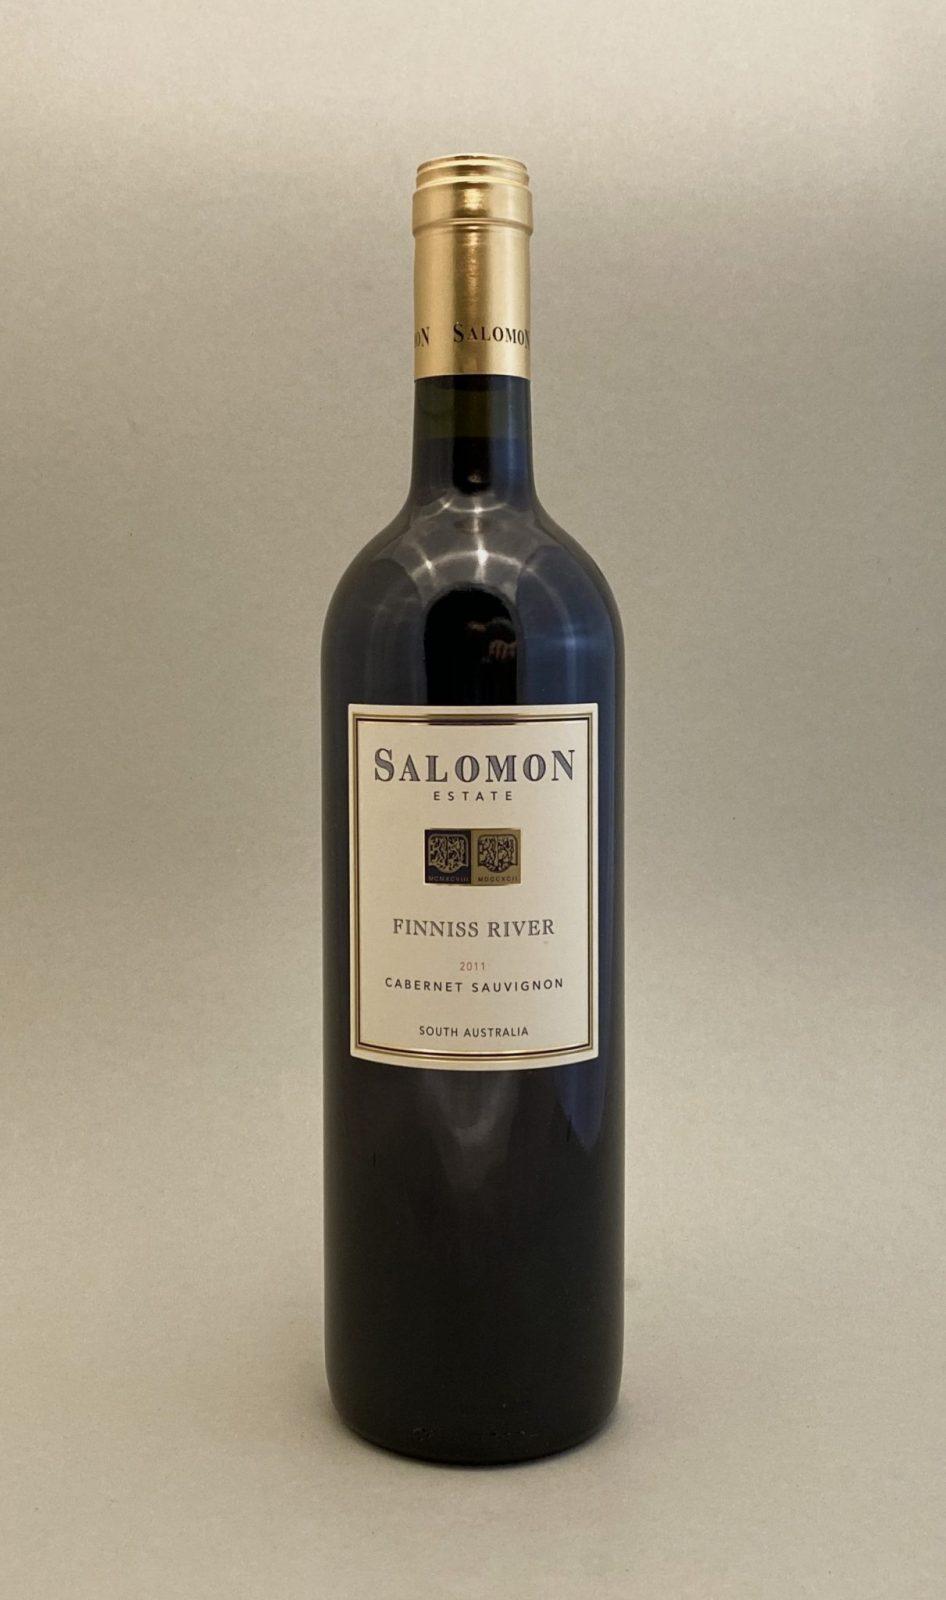 SALOMON Finniss River Caberner Sauvignon 2011, vinoteka Bratislava slnecnice mesto, petrzalka, vino červene z Australie